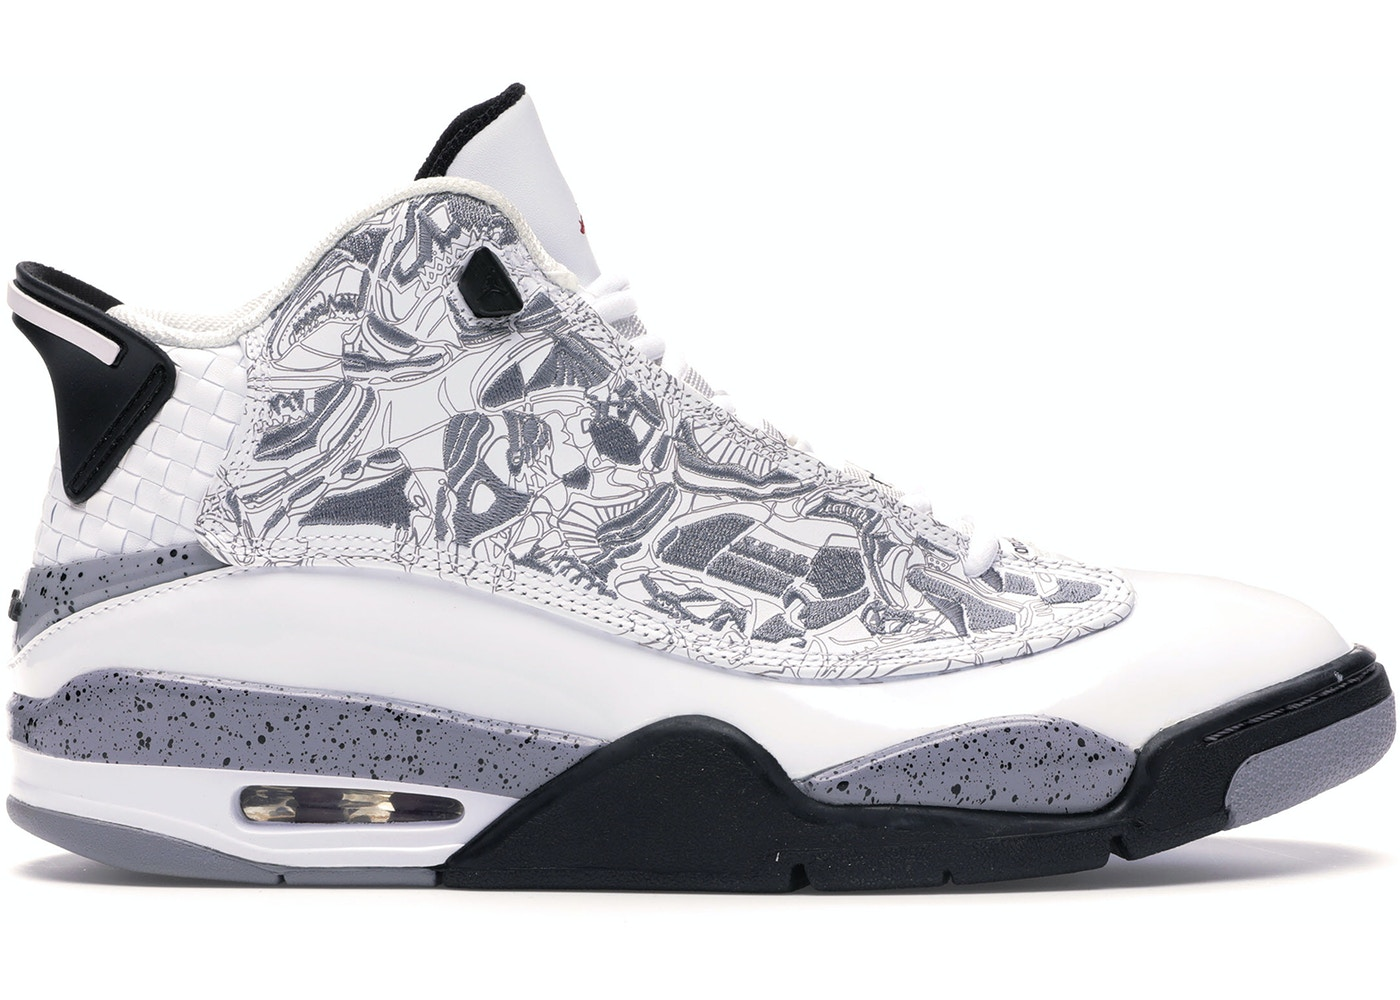 acb7be78dde799 Air Jordan Other Shoes - Last Sale